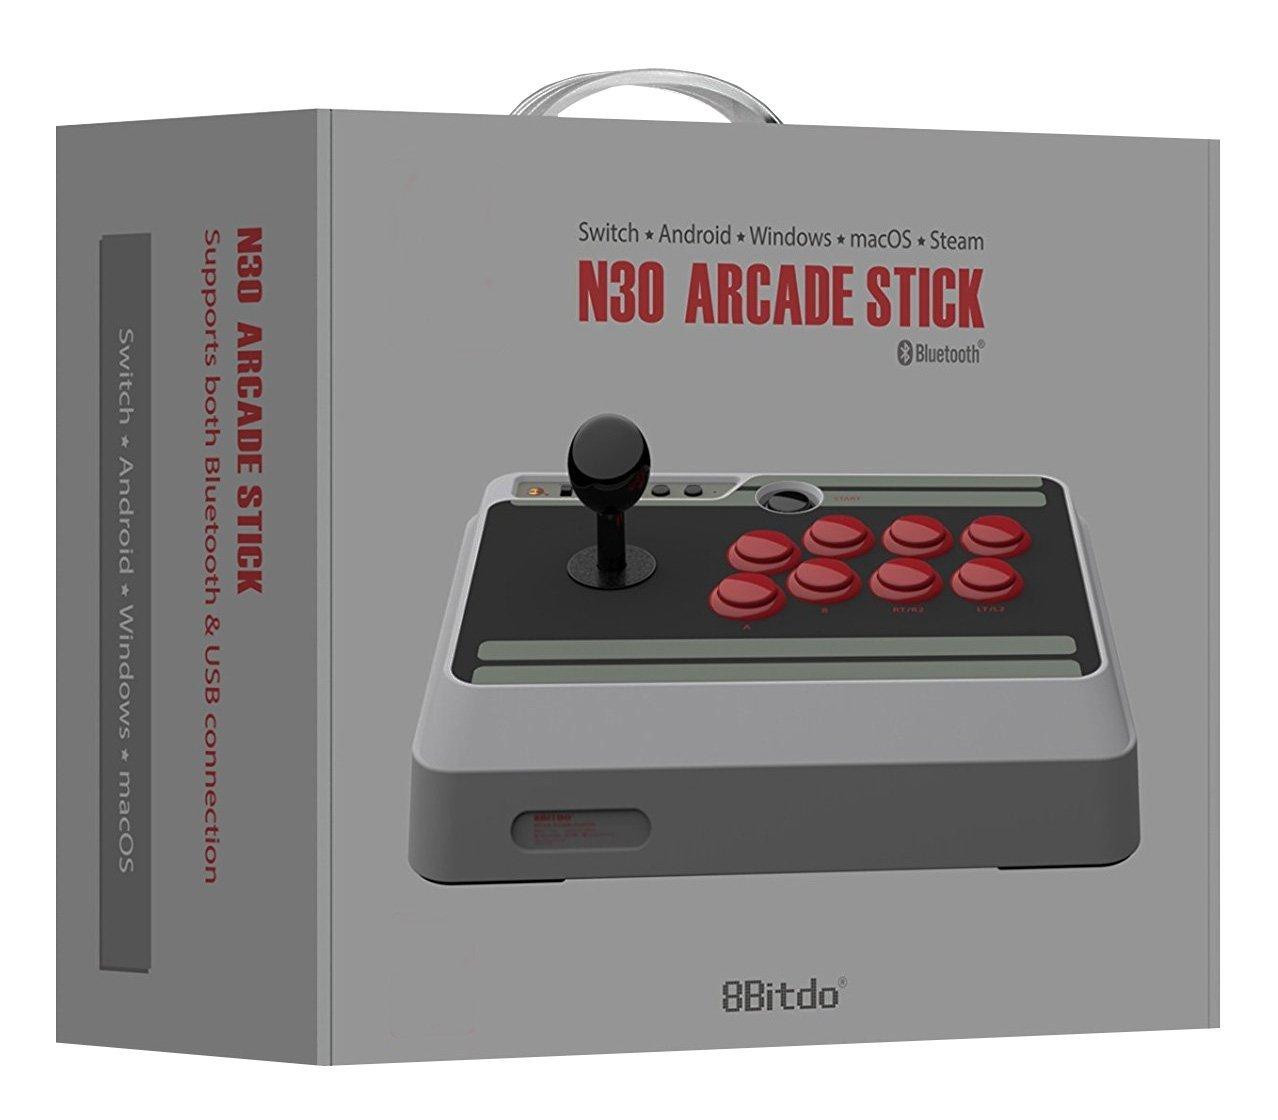 Stick Arcade 8bitdo N30 pour Nintendo Switch, iOS, Android, Windows